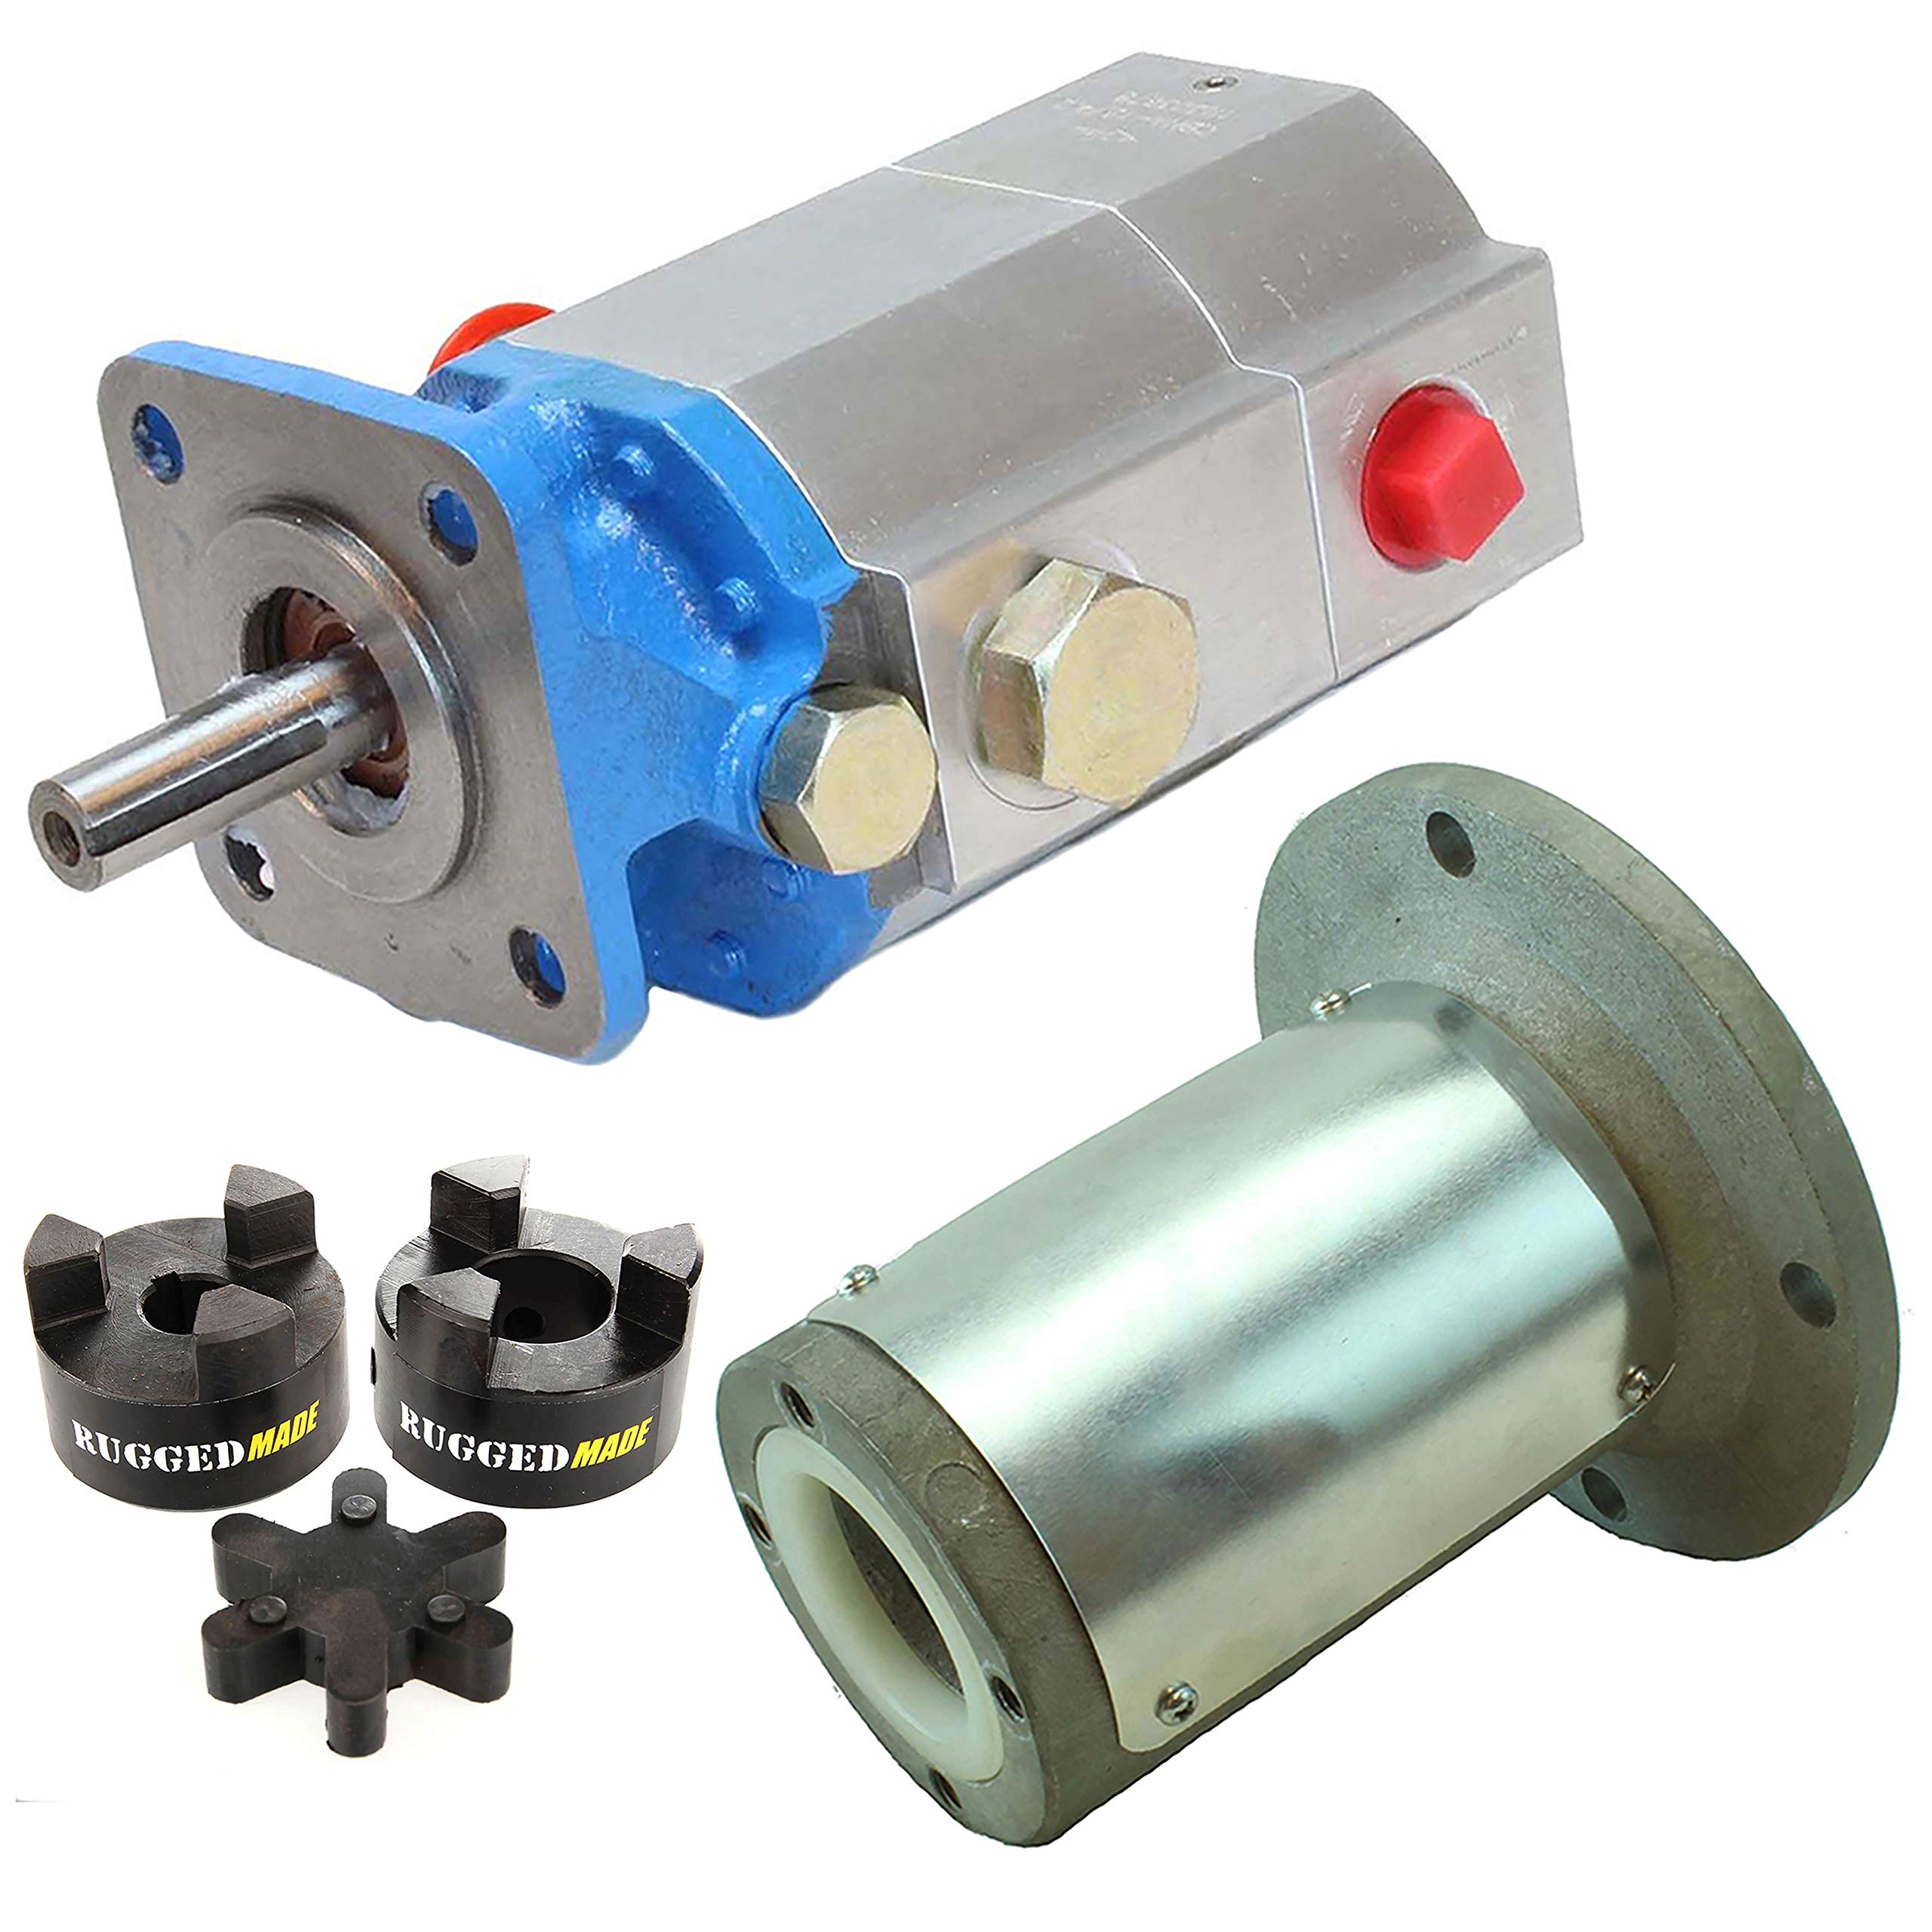 RuggedMade Hydraulic Log Splitter Build Kit - 11 GPM Pump, Engine Mounting Bracket, Coupler for 3/4'' Engine Shaft